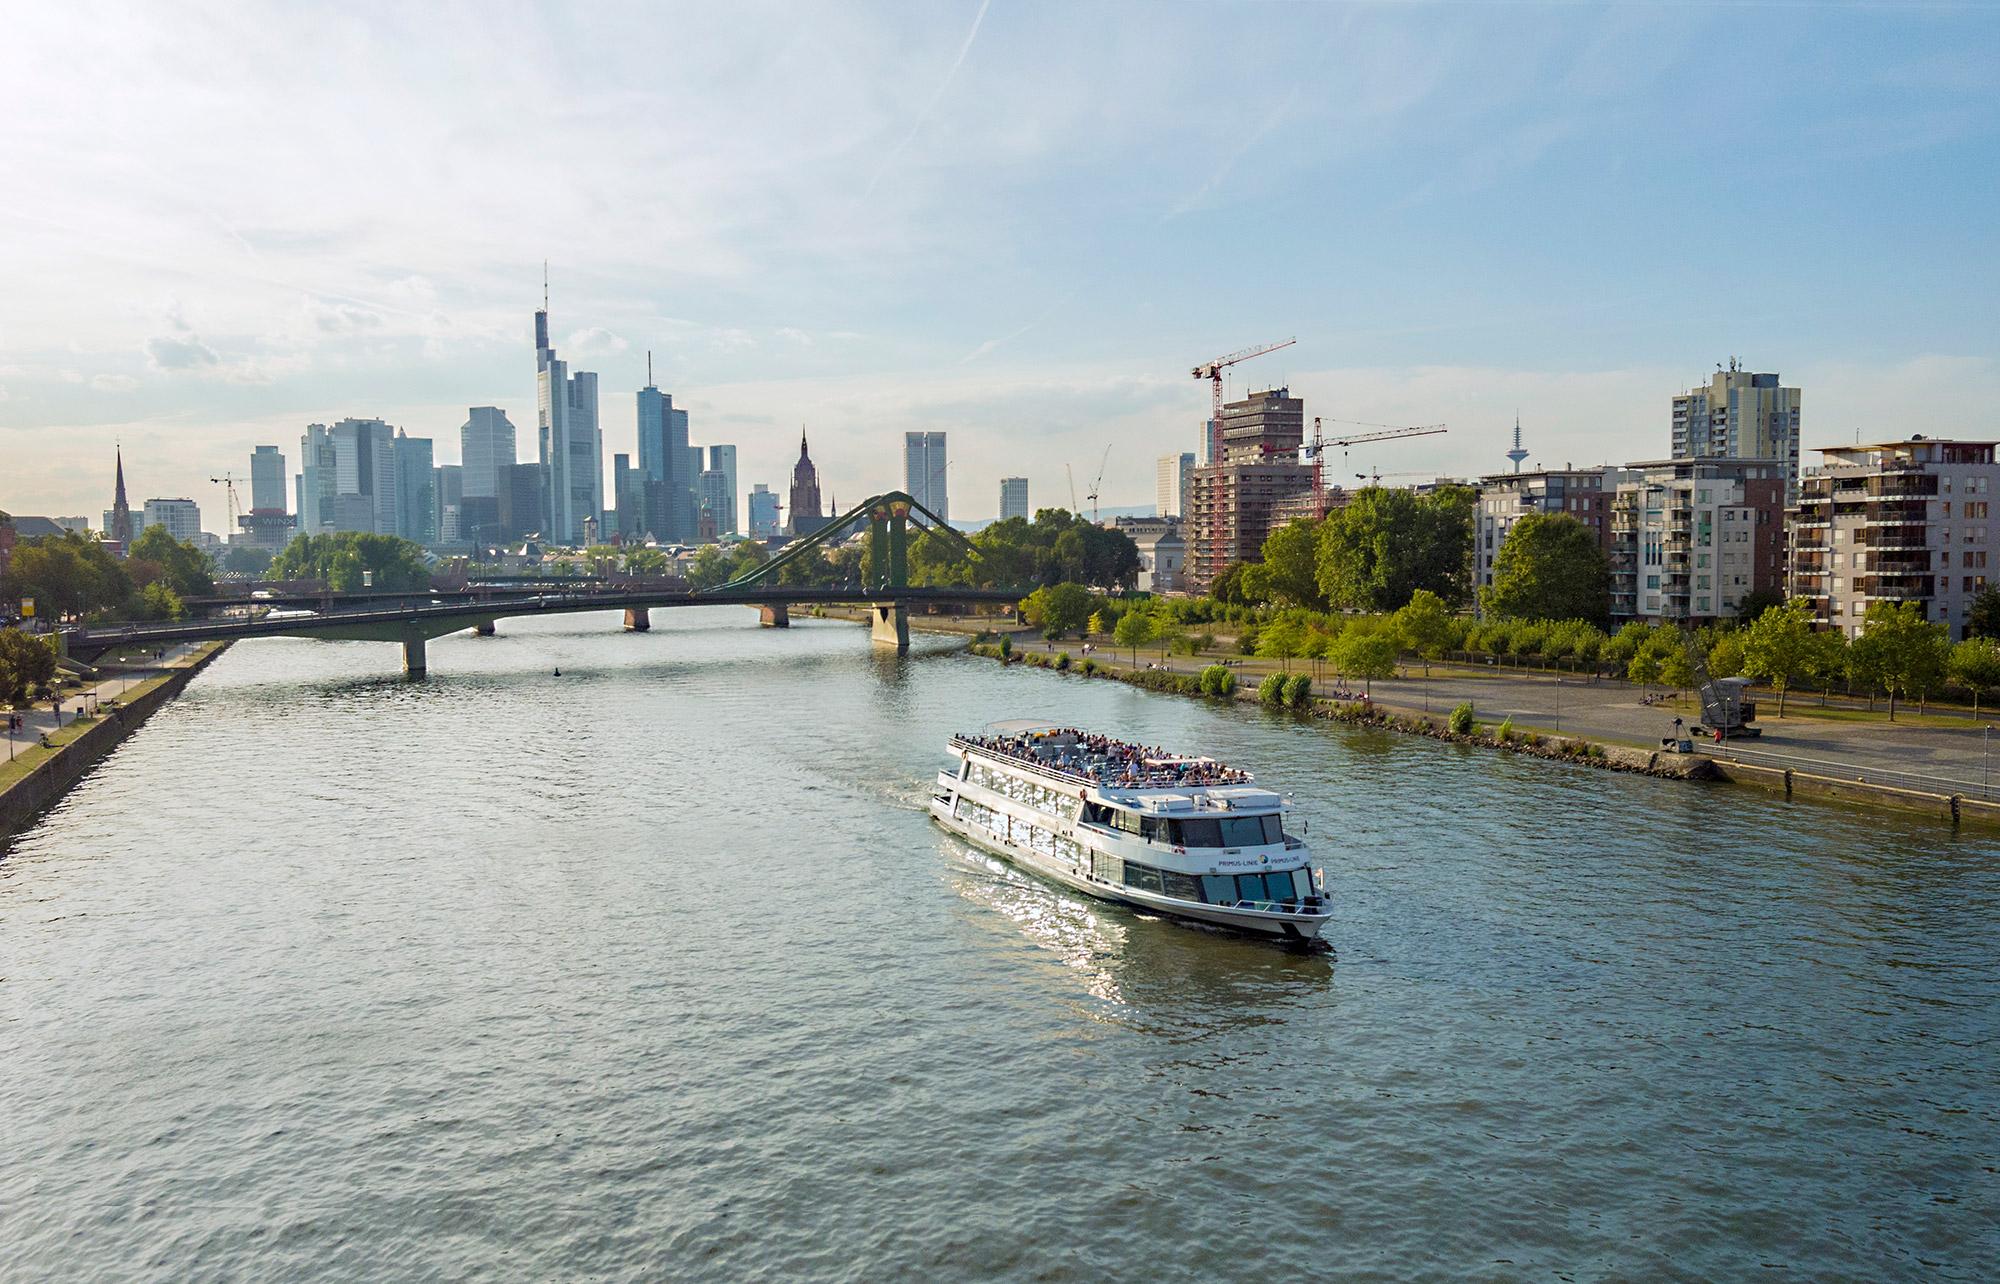 ecbe4663f70bdd Schiff Nautilus – das Flaggschiff - Frankfurter Personenschiffahrt ...